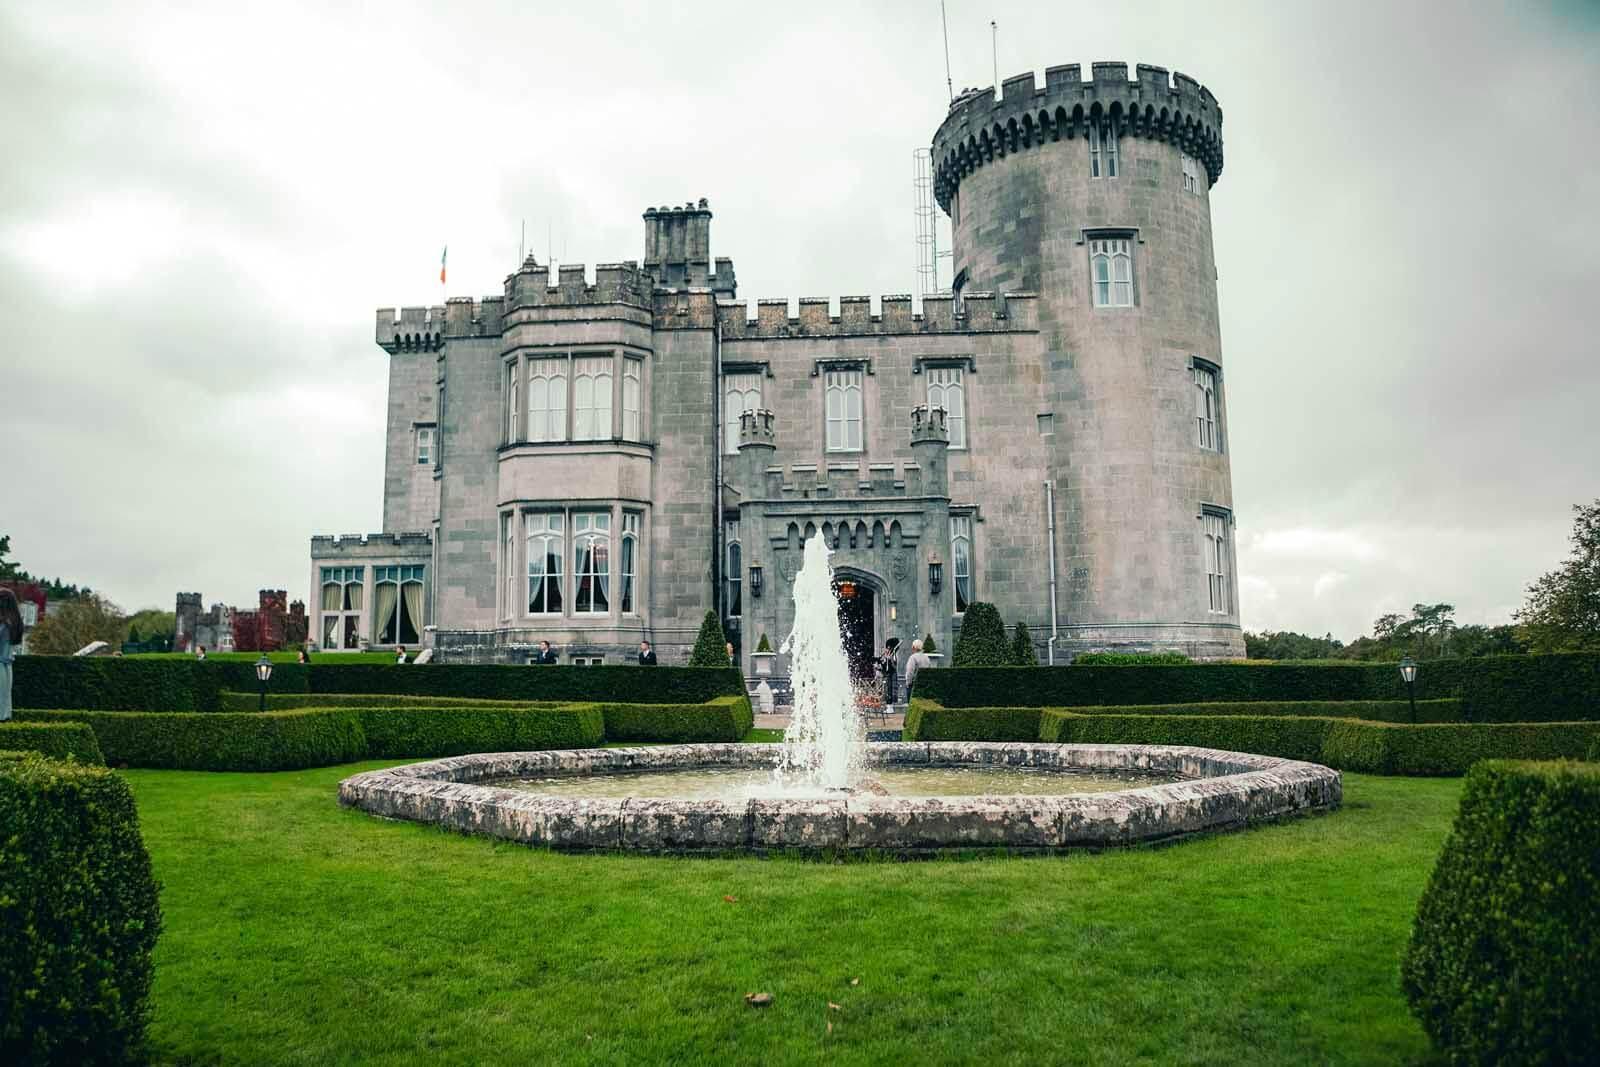 Dromoland Castle Hotel in Ireland